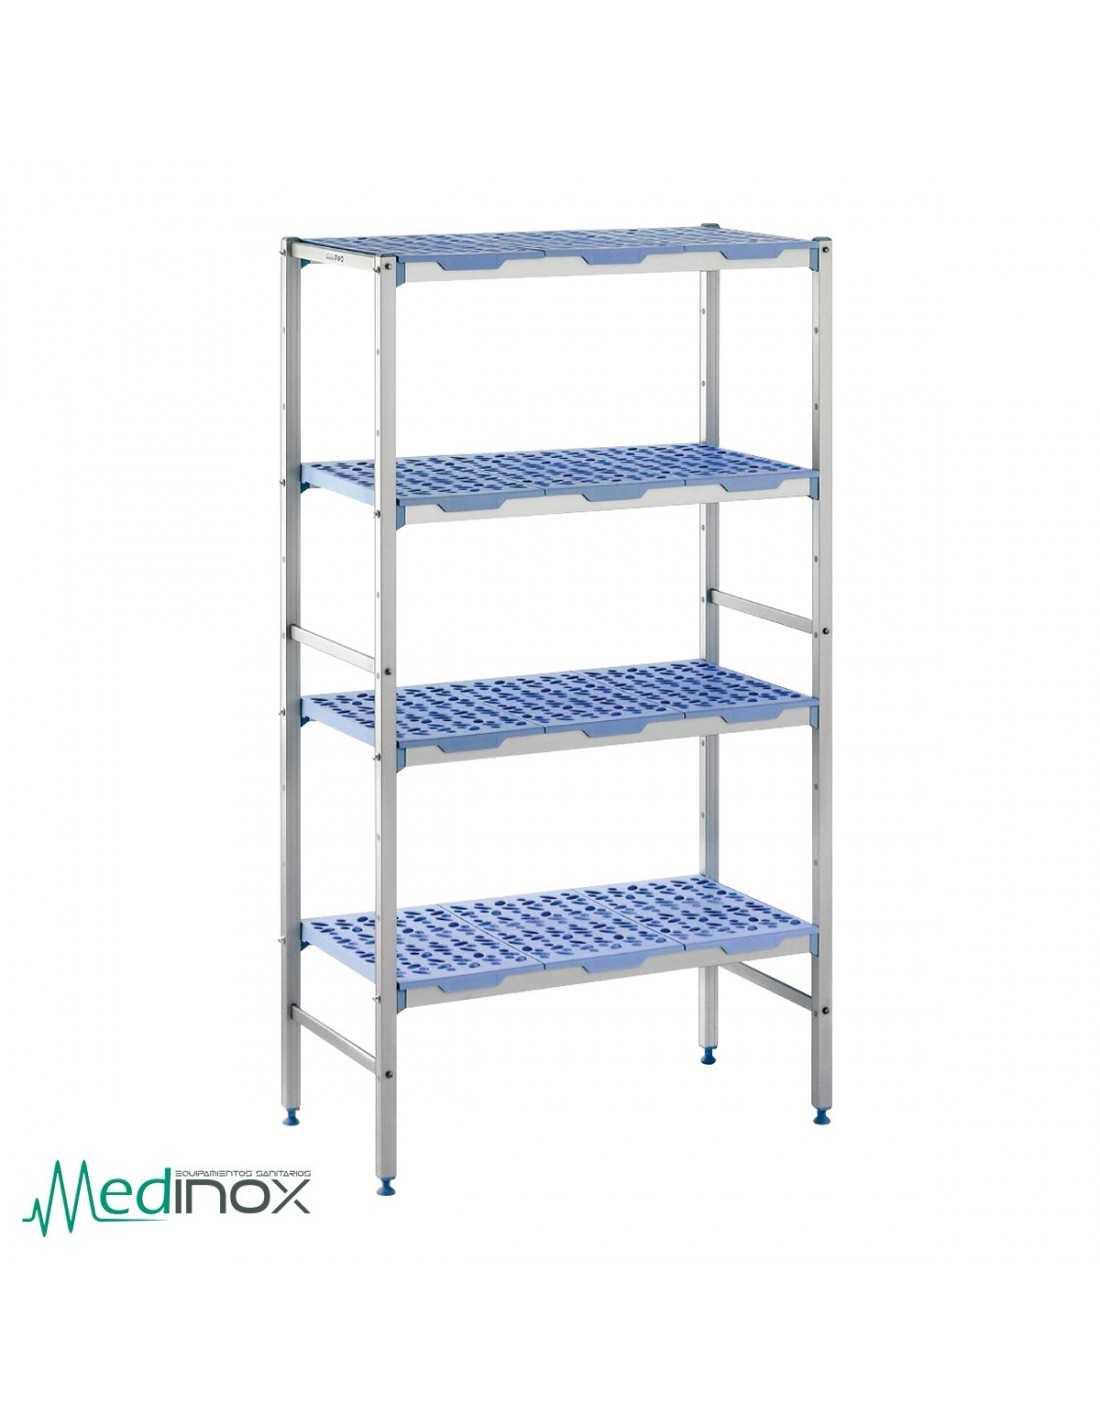 Estanterias metalicas nigm600 estanterias industriales - Estanterias metalicas modulares ...